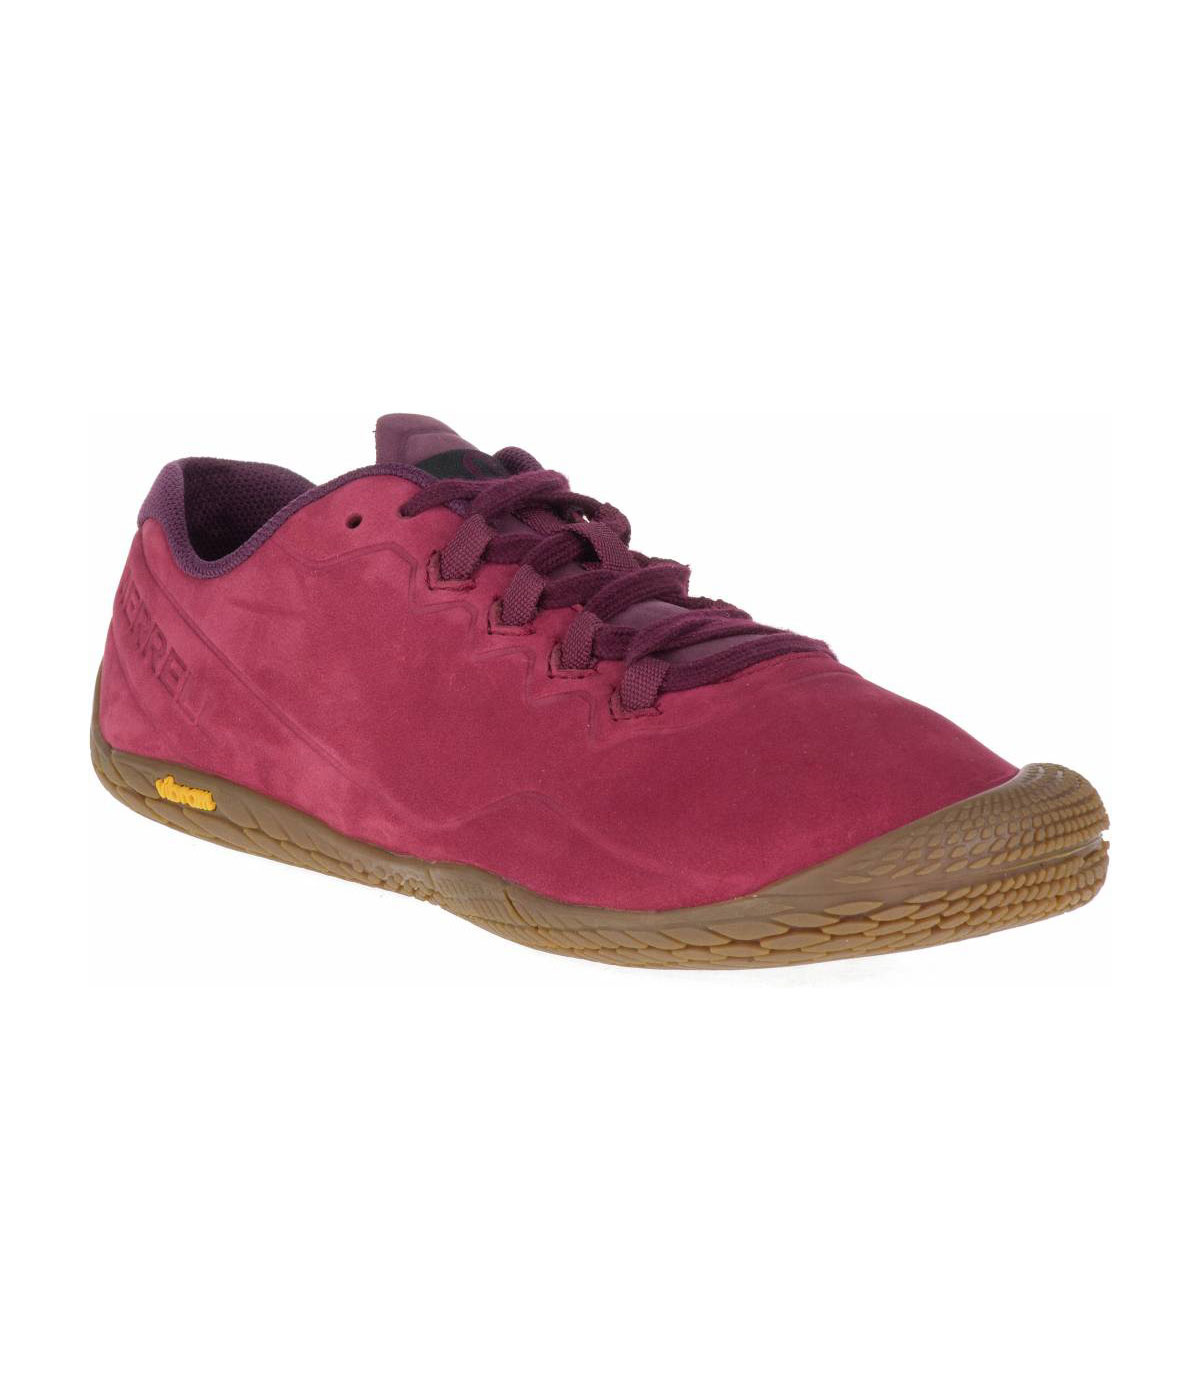 Merrell Vapor Glove 3 - Luna Leather -  Pomegranate